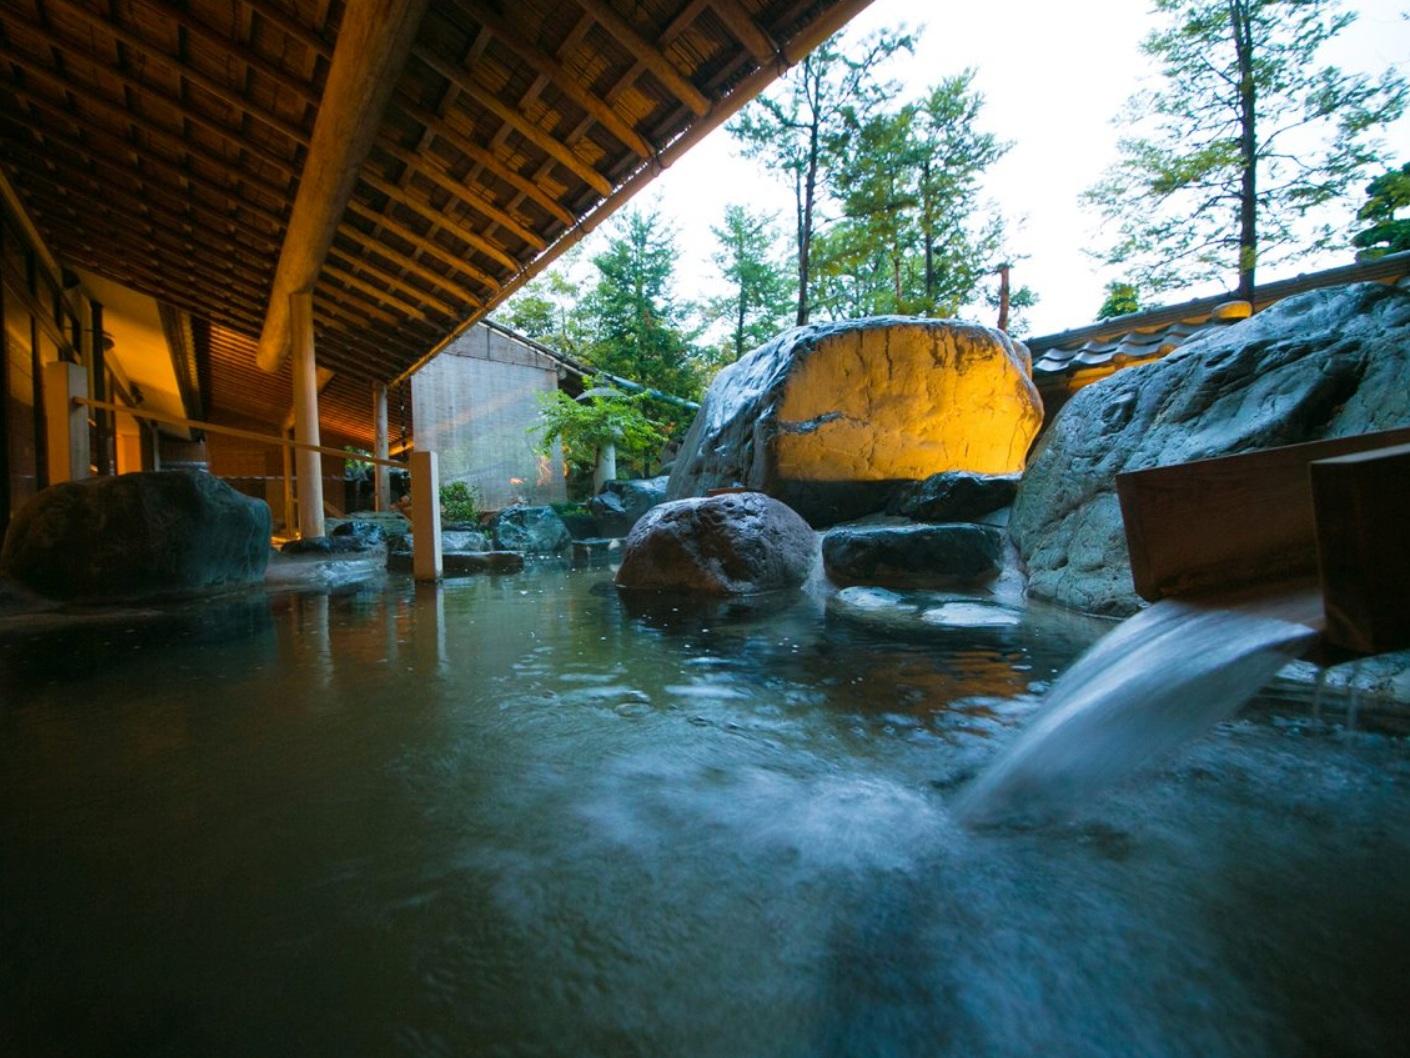 Hanaougi onsen bath